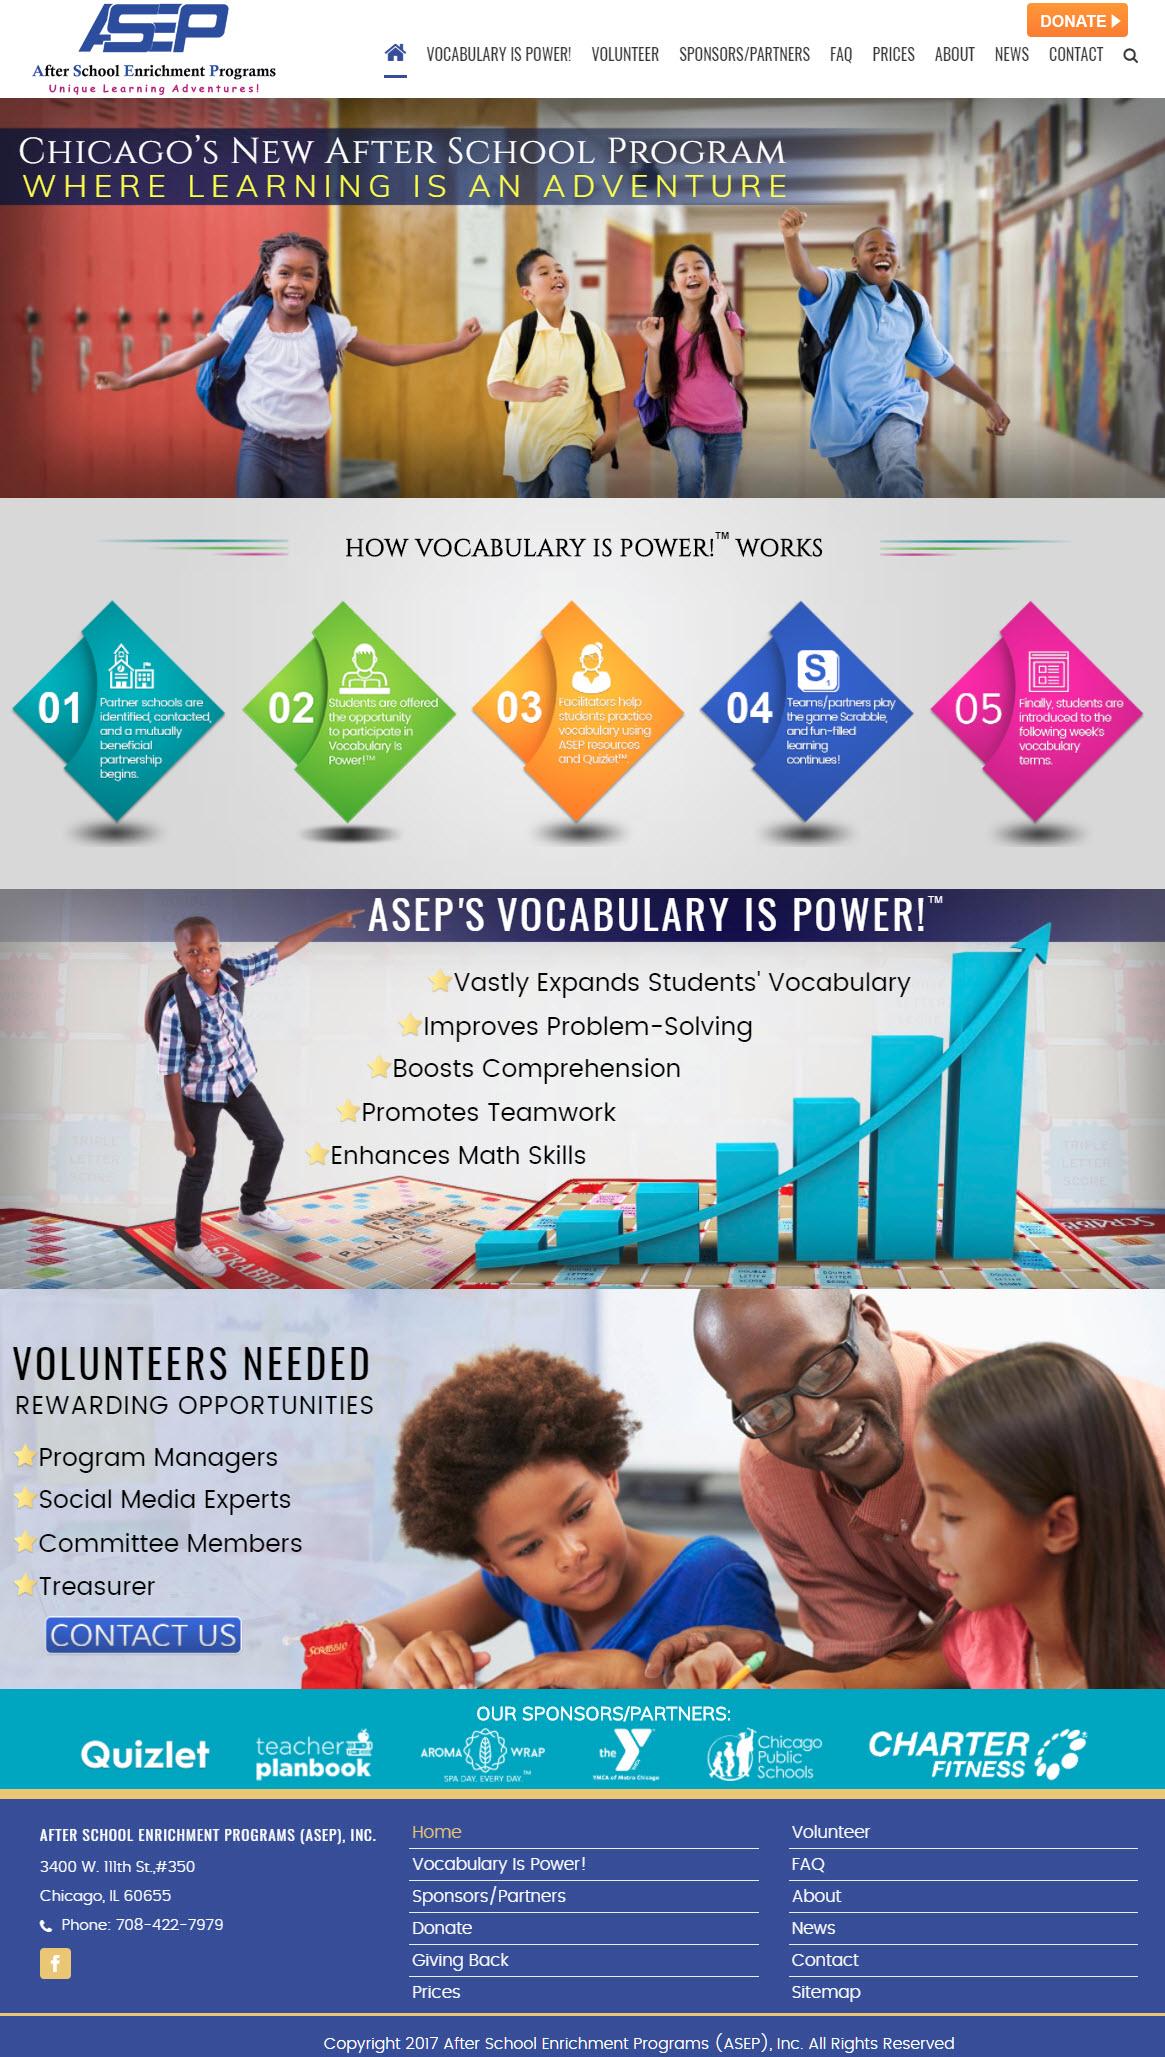 asepchgo Charitable Organization Website Design